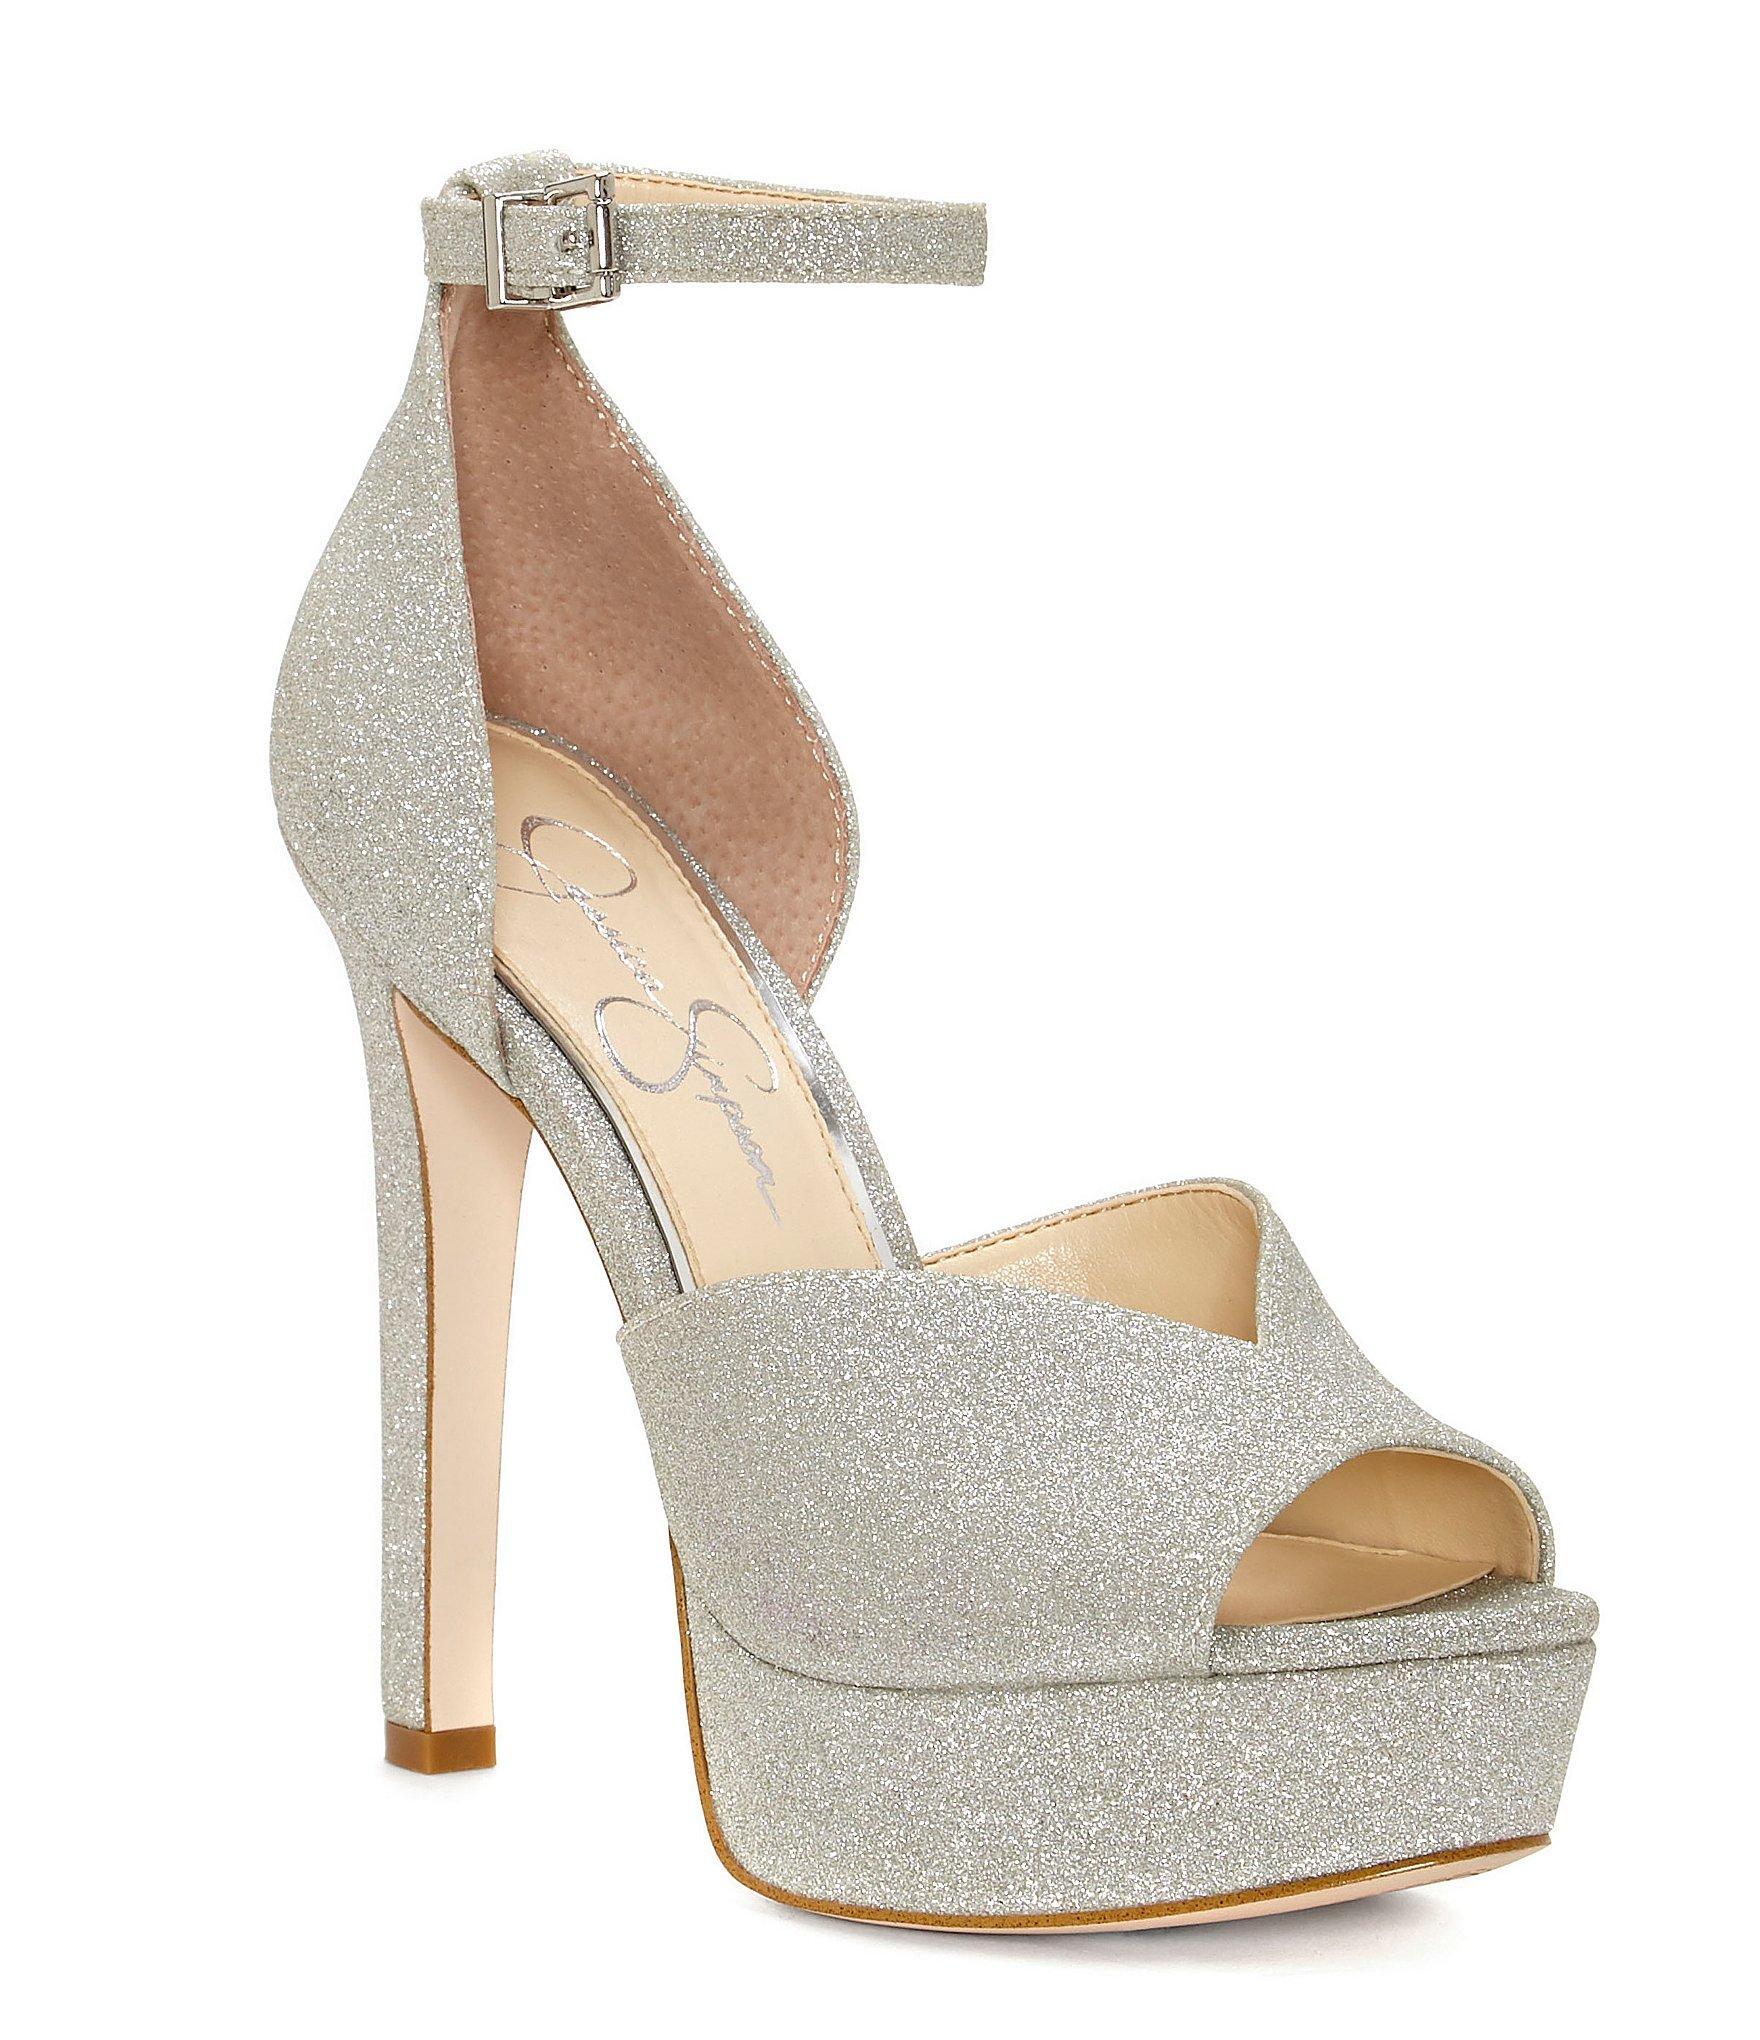 92a5994c6b Jessica Simpson Briya Micro Glitter Peep Toe Platform With Ankle ...